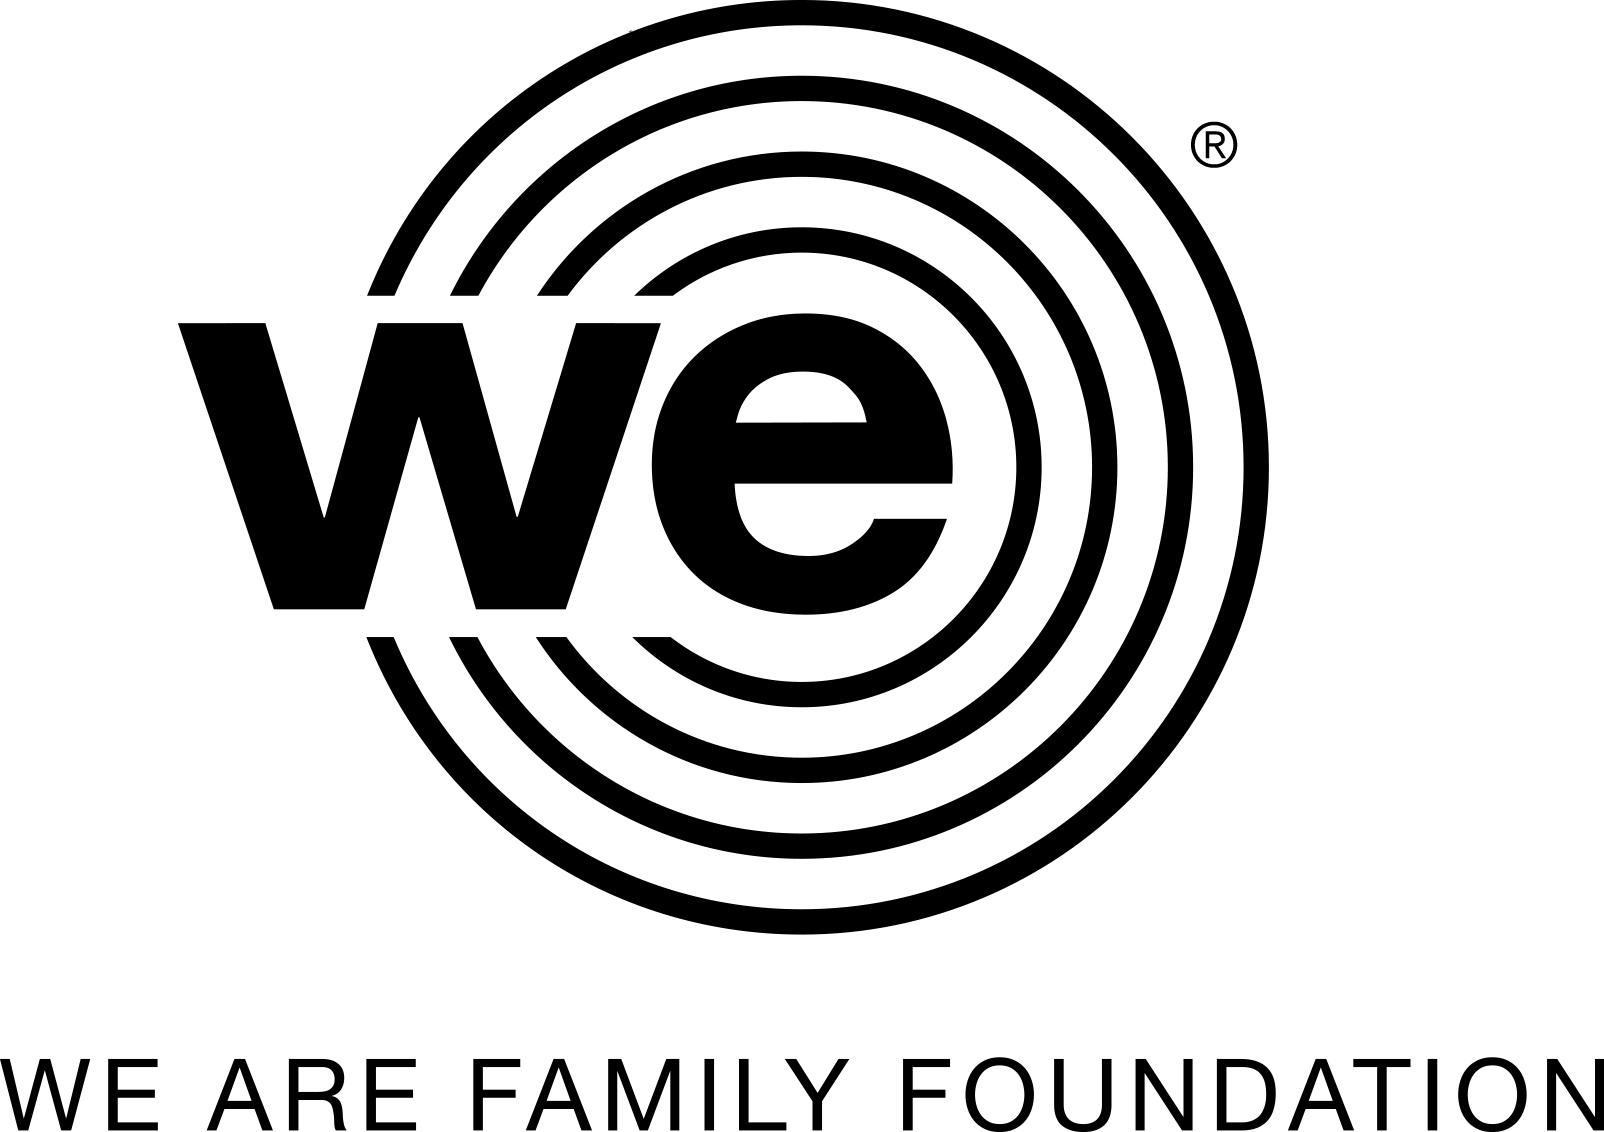 WAFF_LogoBug_WithName_Centered.jpg